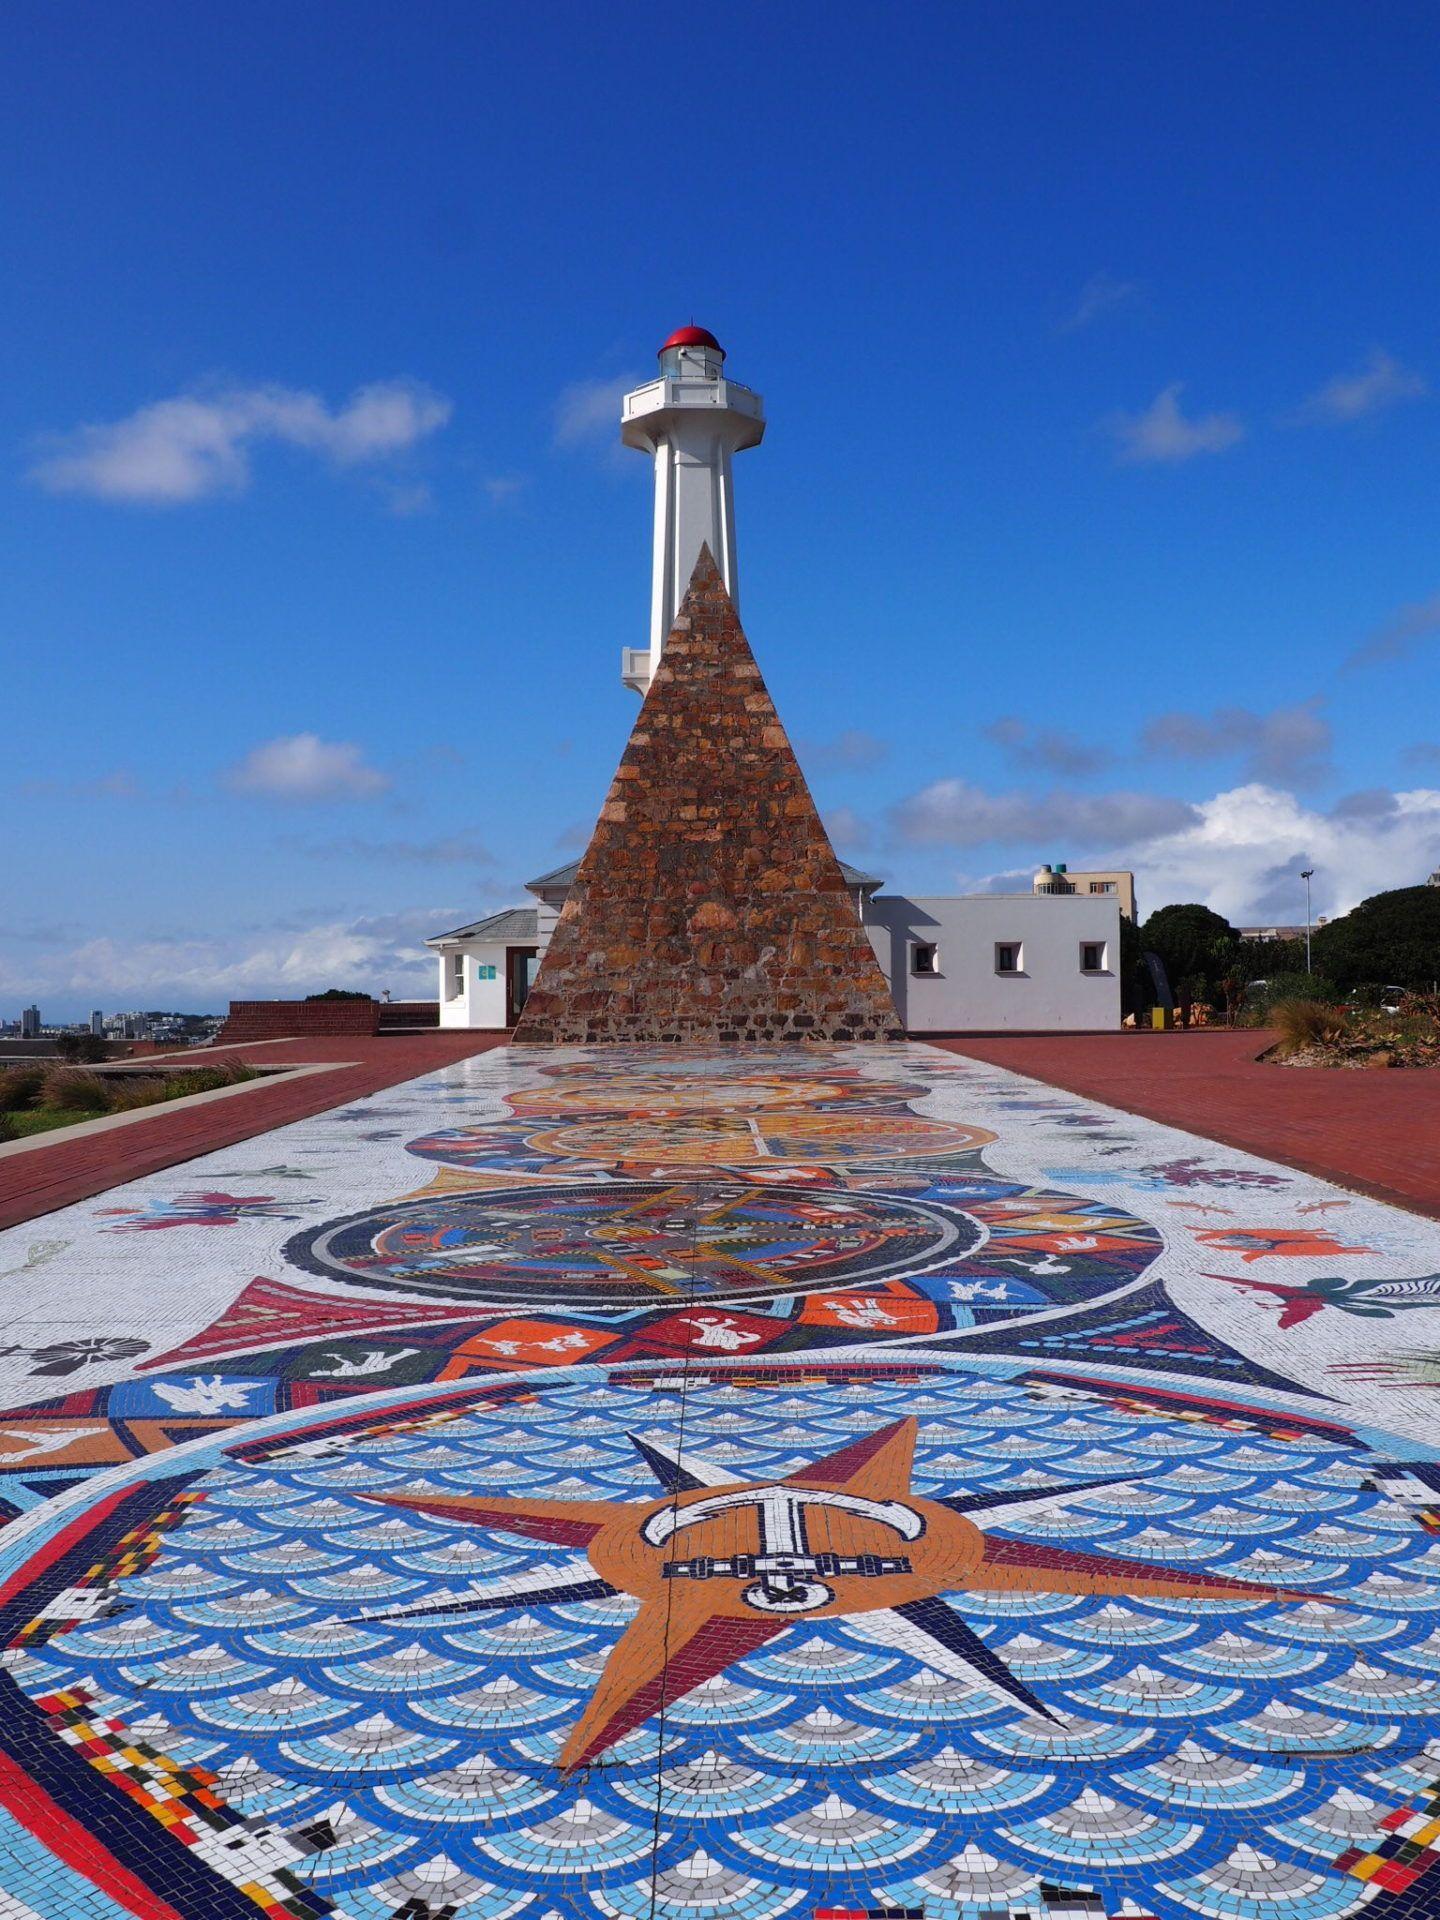 Strolling Along The Route 67 In Nelson Mandela Bay Port Elizabeth Travelsisters Cc In 2020 Port Elizabeth Route 67 Route